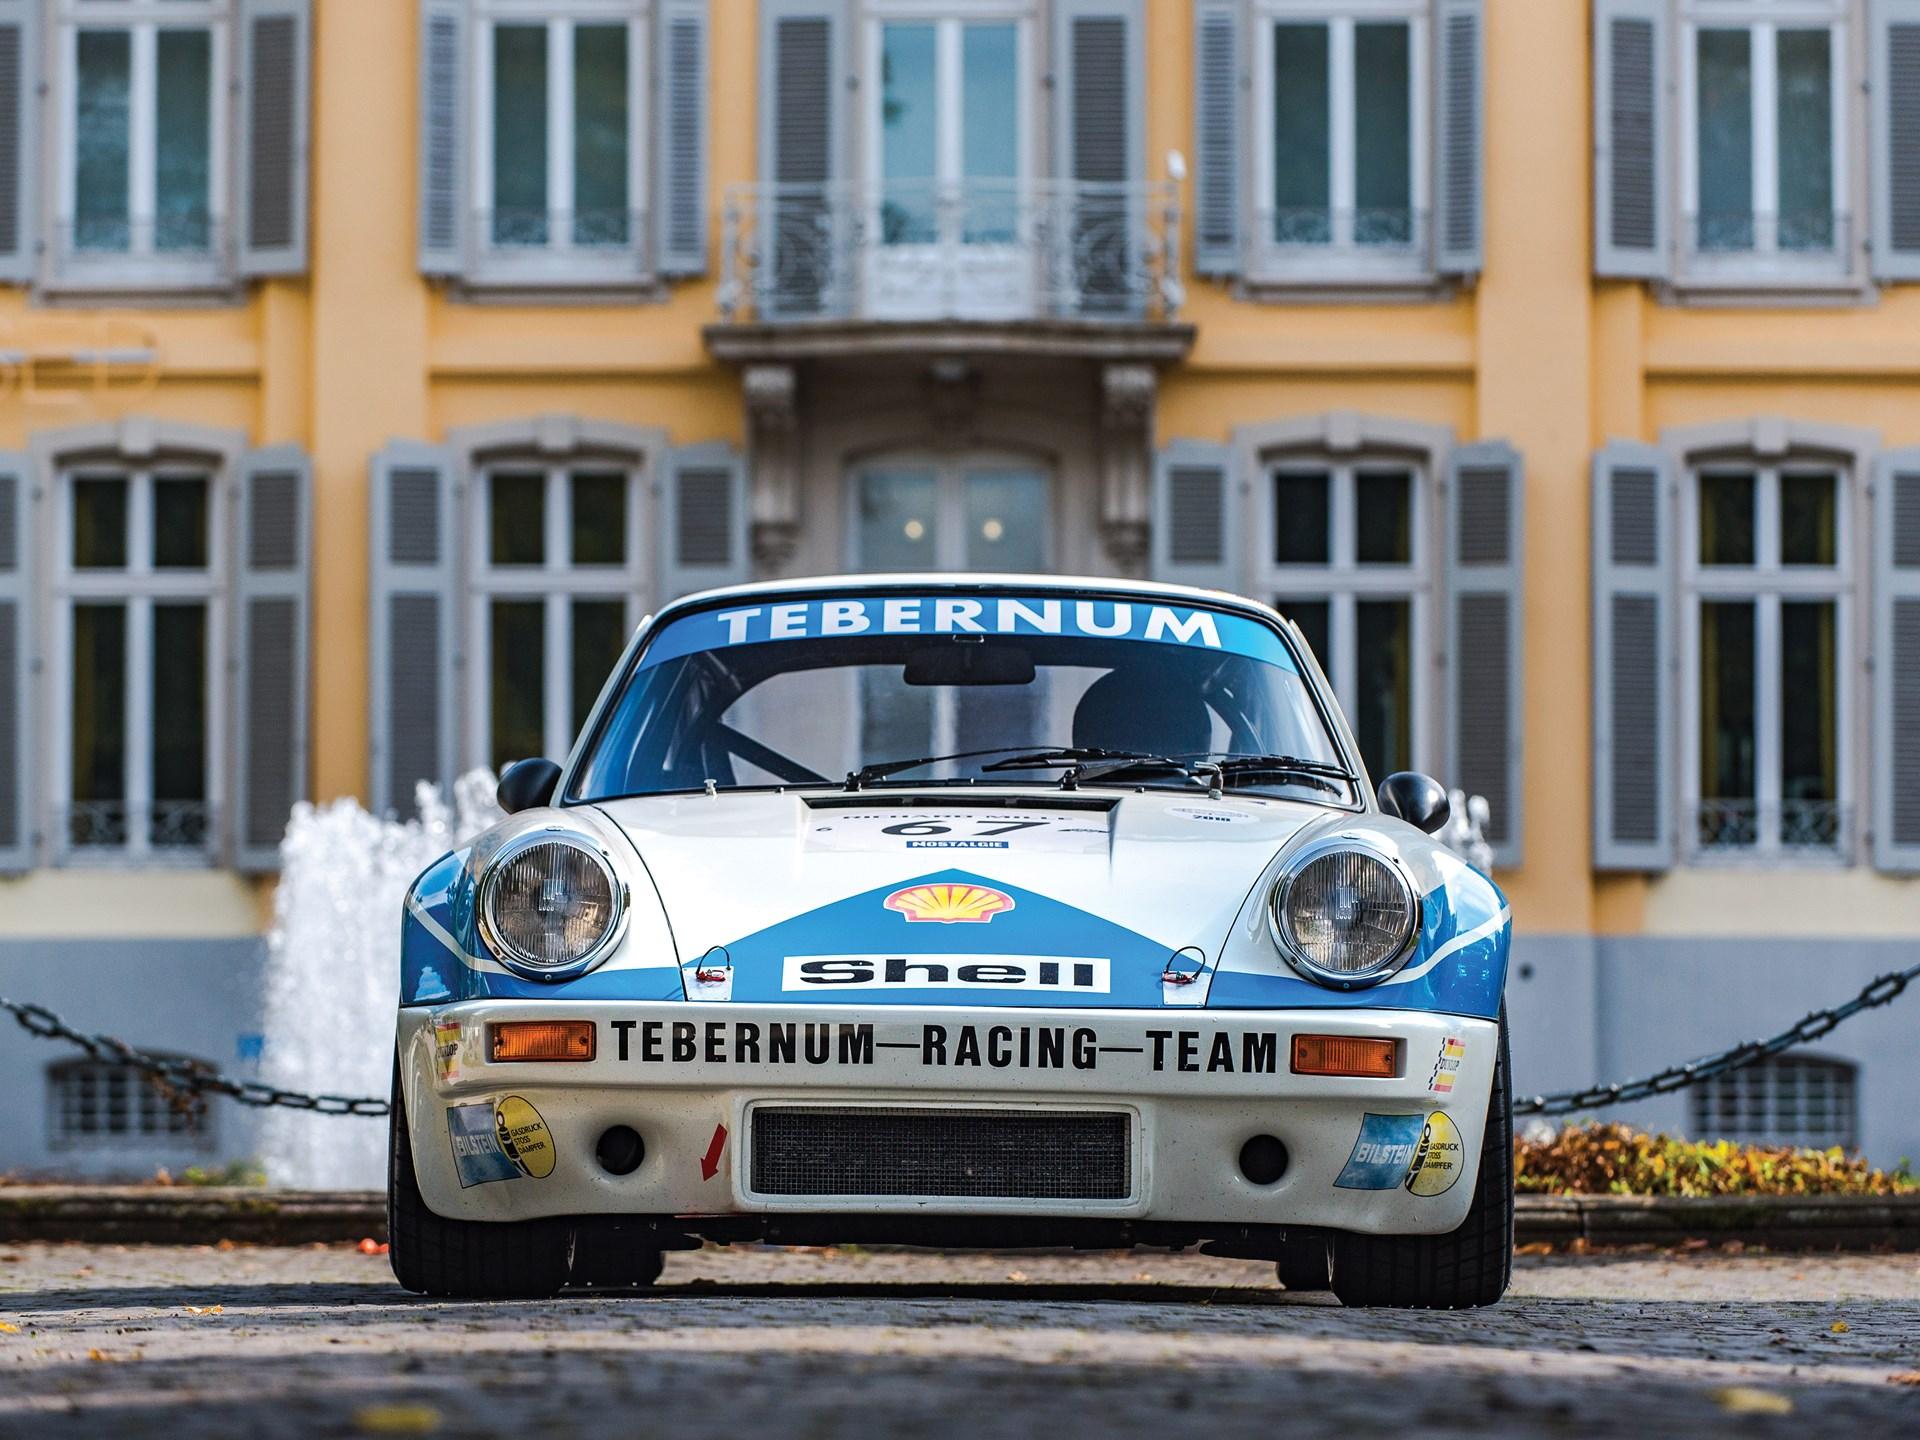 1975 Porsche 911 Carrera RSR 3.0